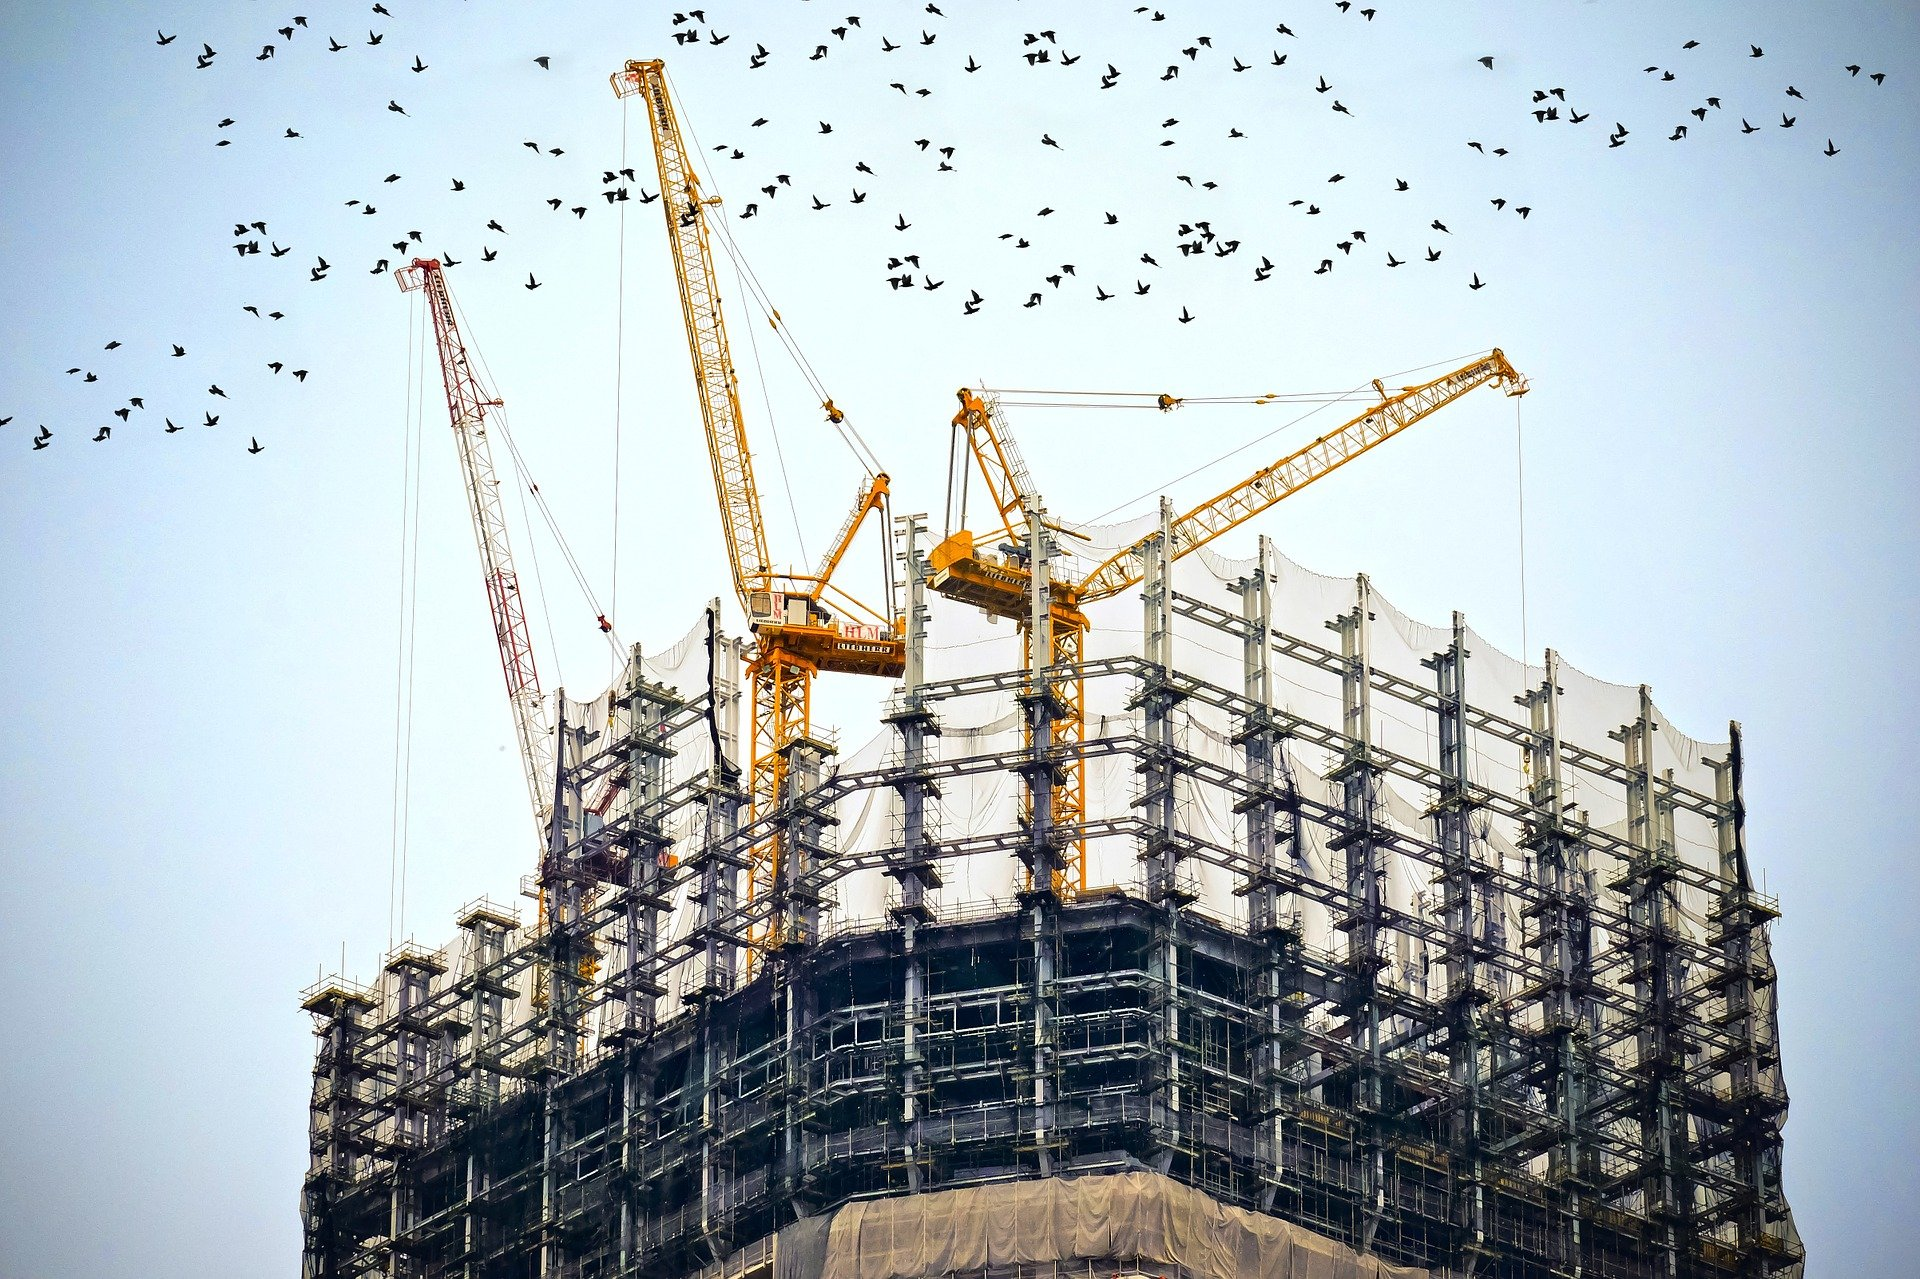 Bauarbeiter aus Slowakei